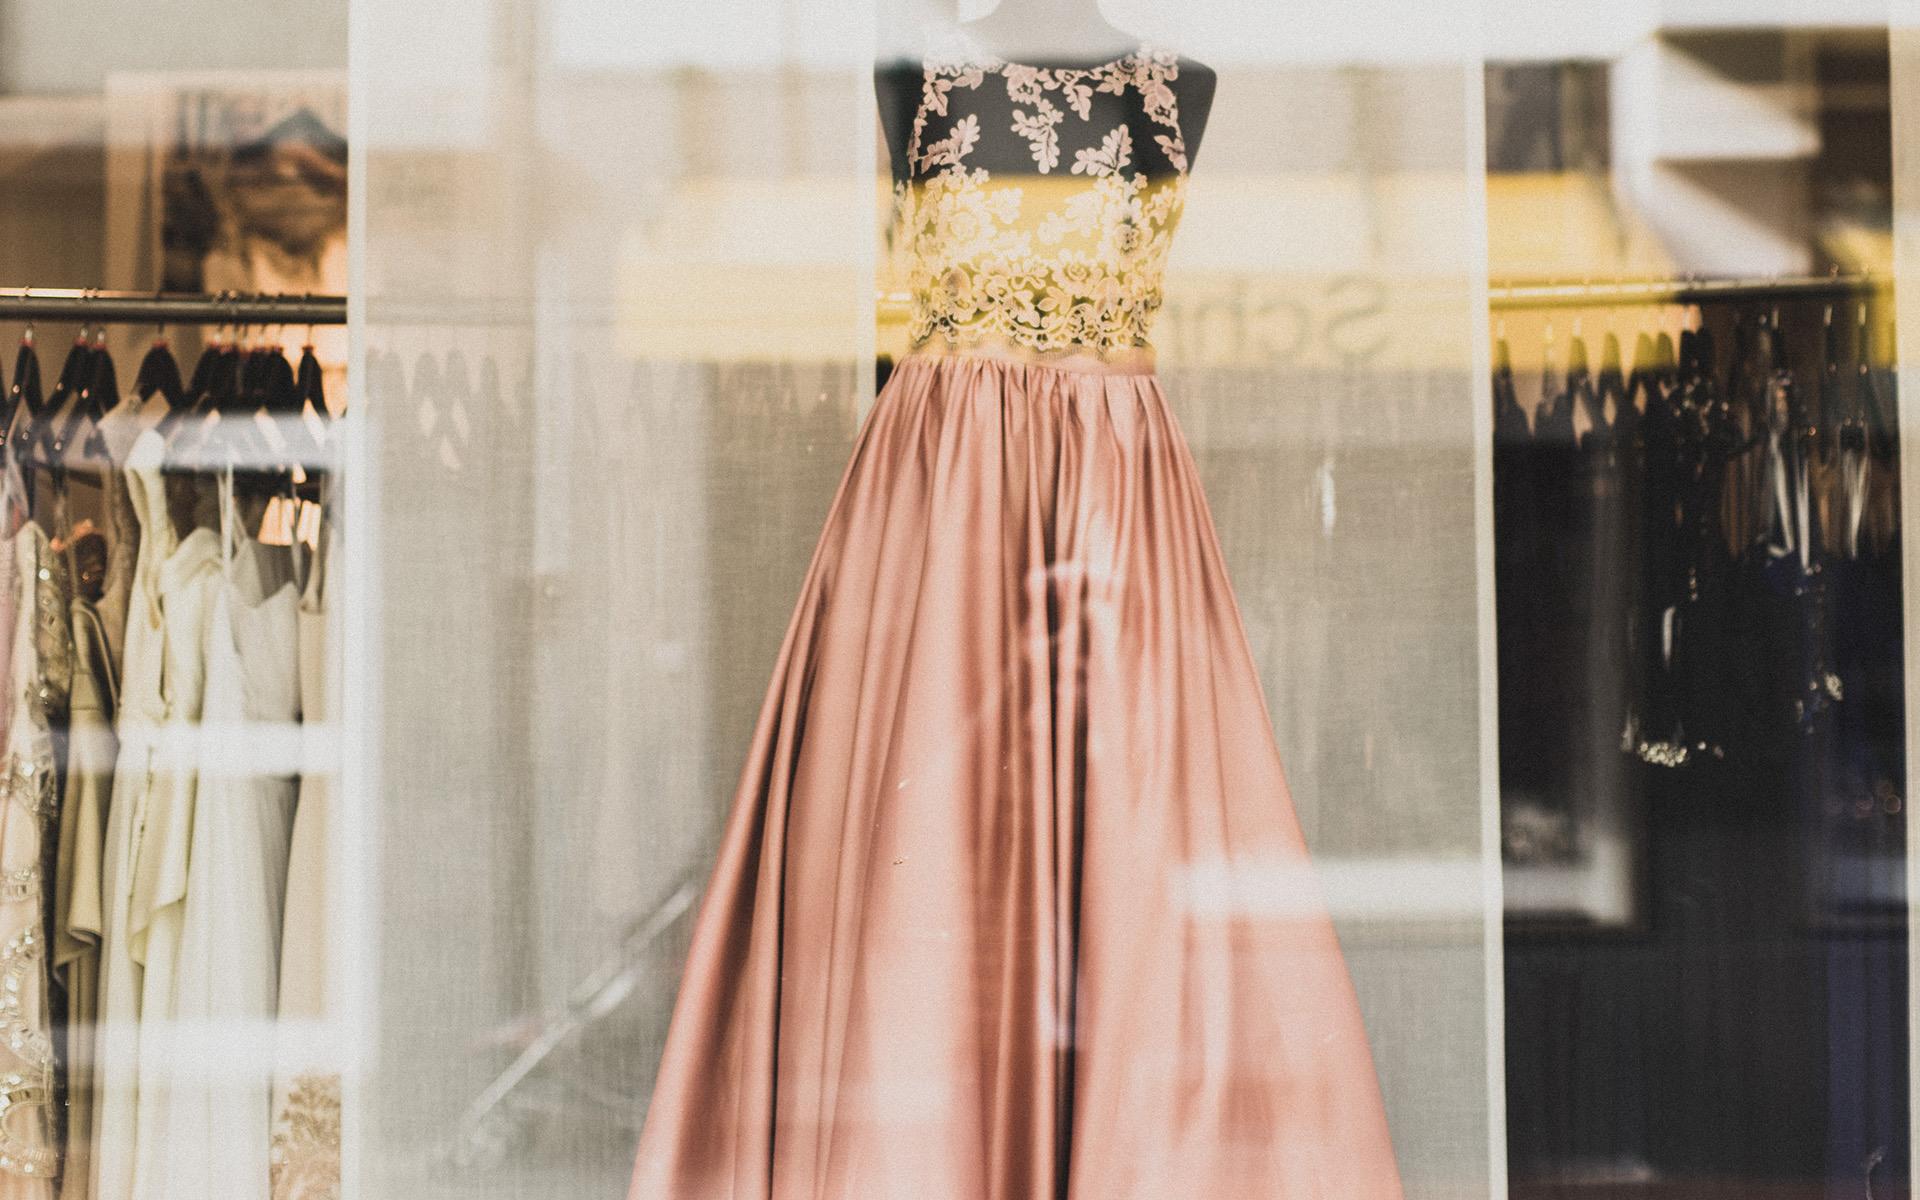 15 Cool Abendkleider Paderborn StylishAbend Genial Abendkleider Paderborn Vertrieb